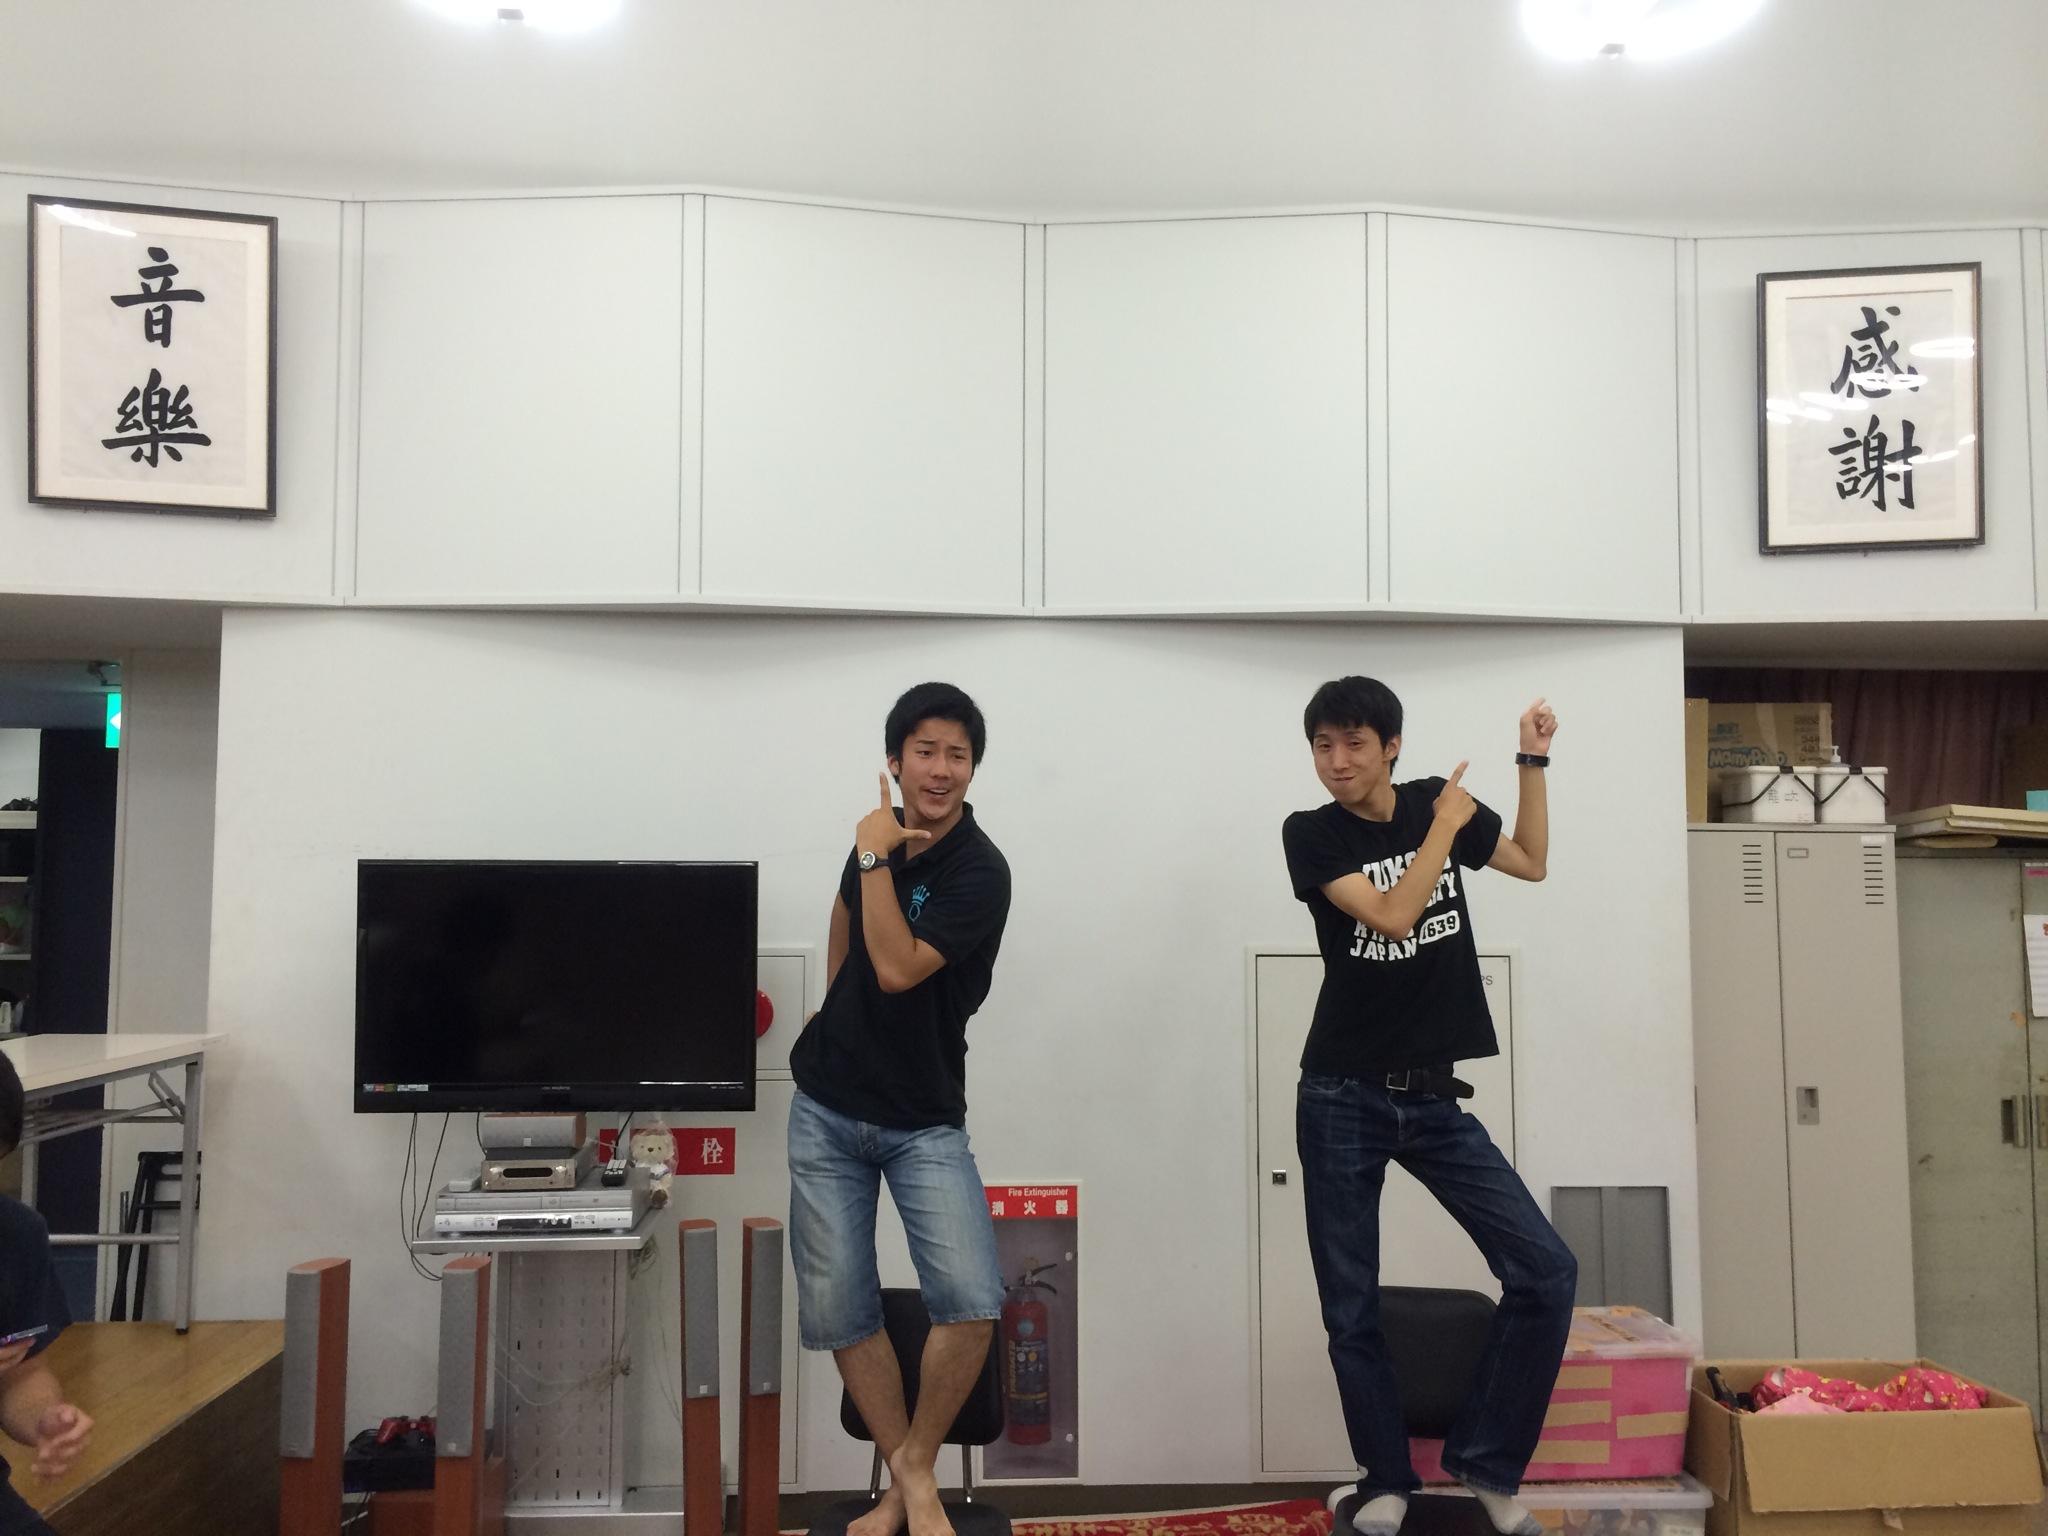 IMG_4172.JPG